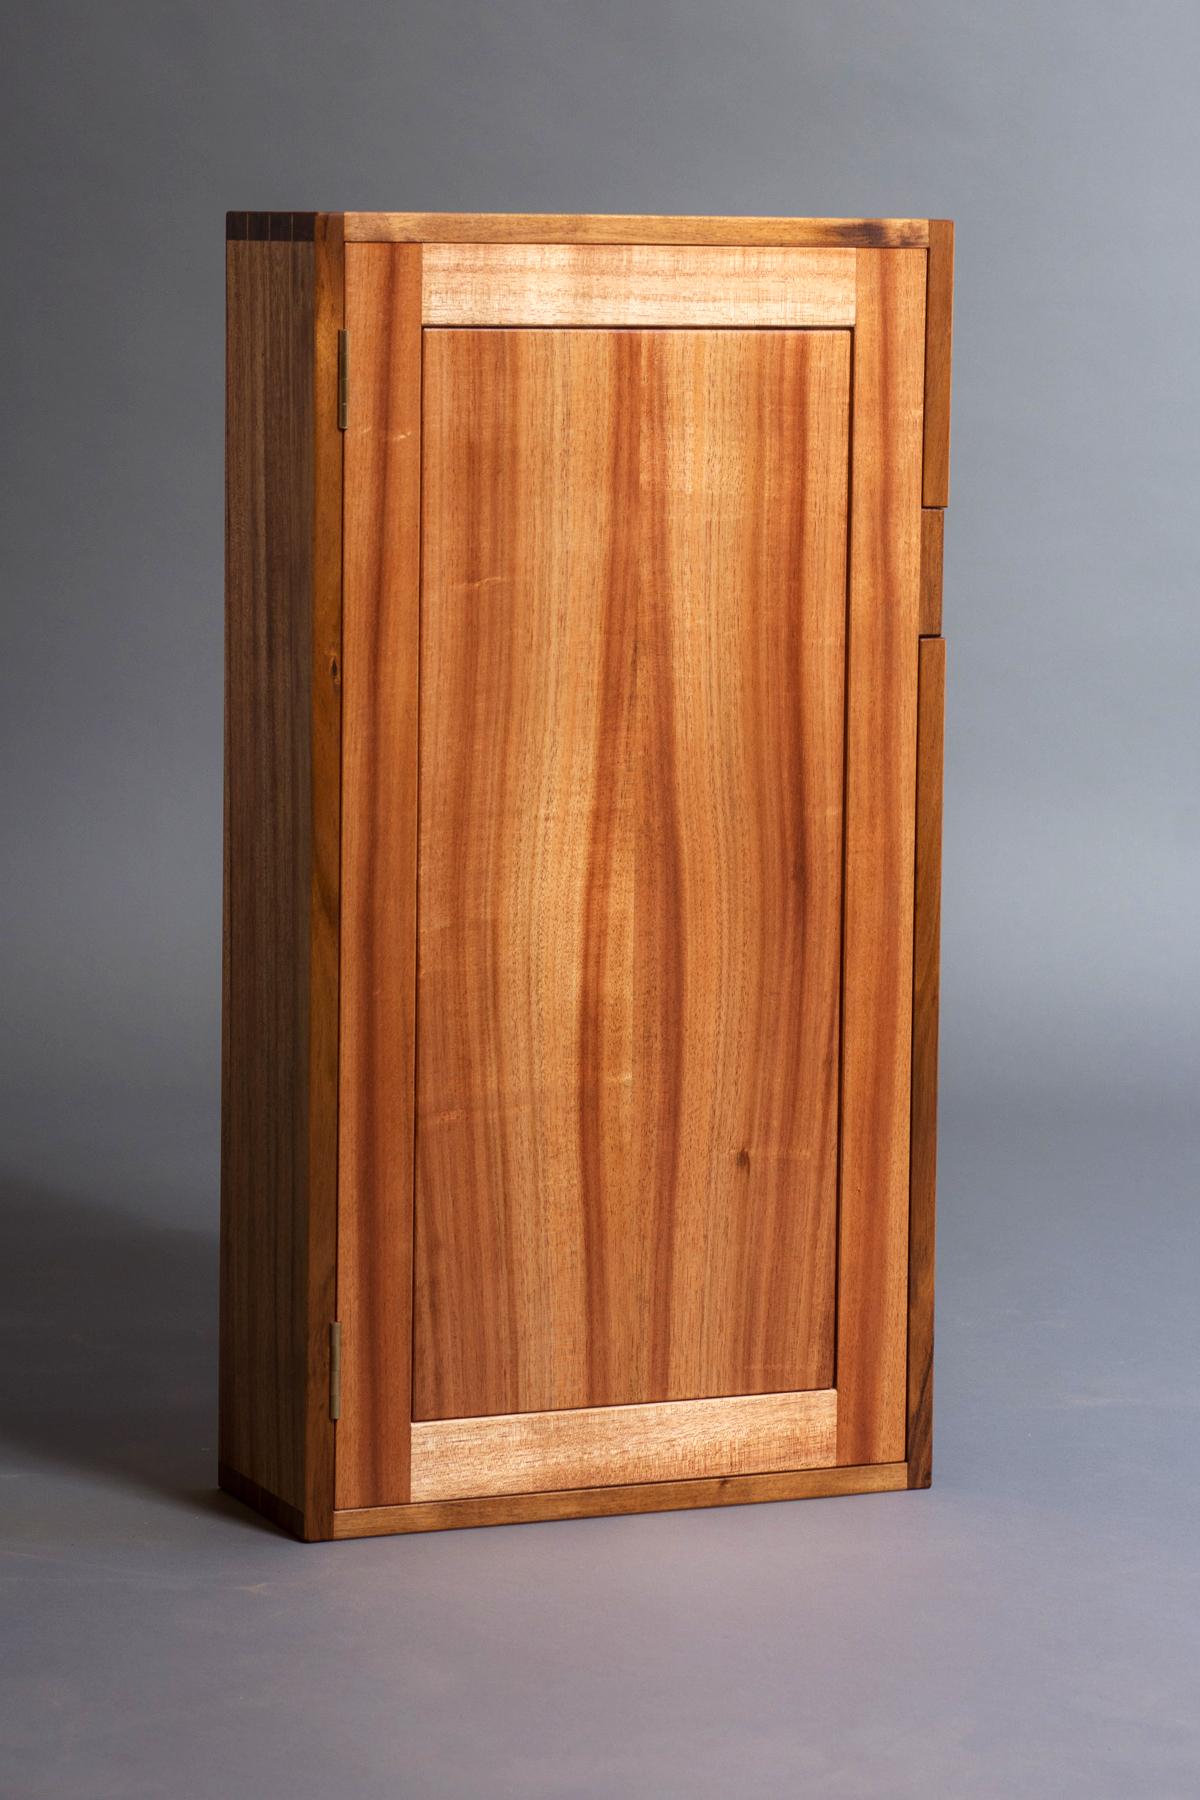 Blackwood Cabinet1 copy.jpg